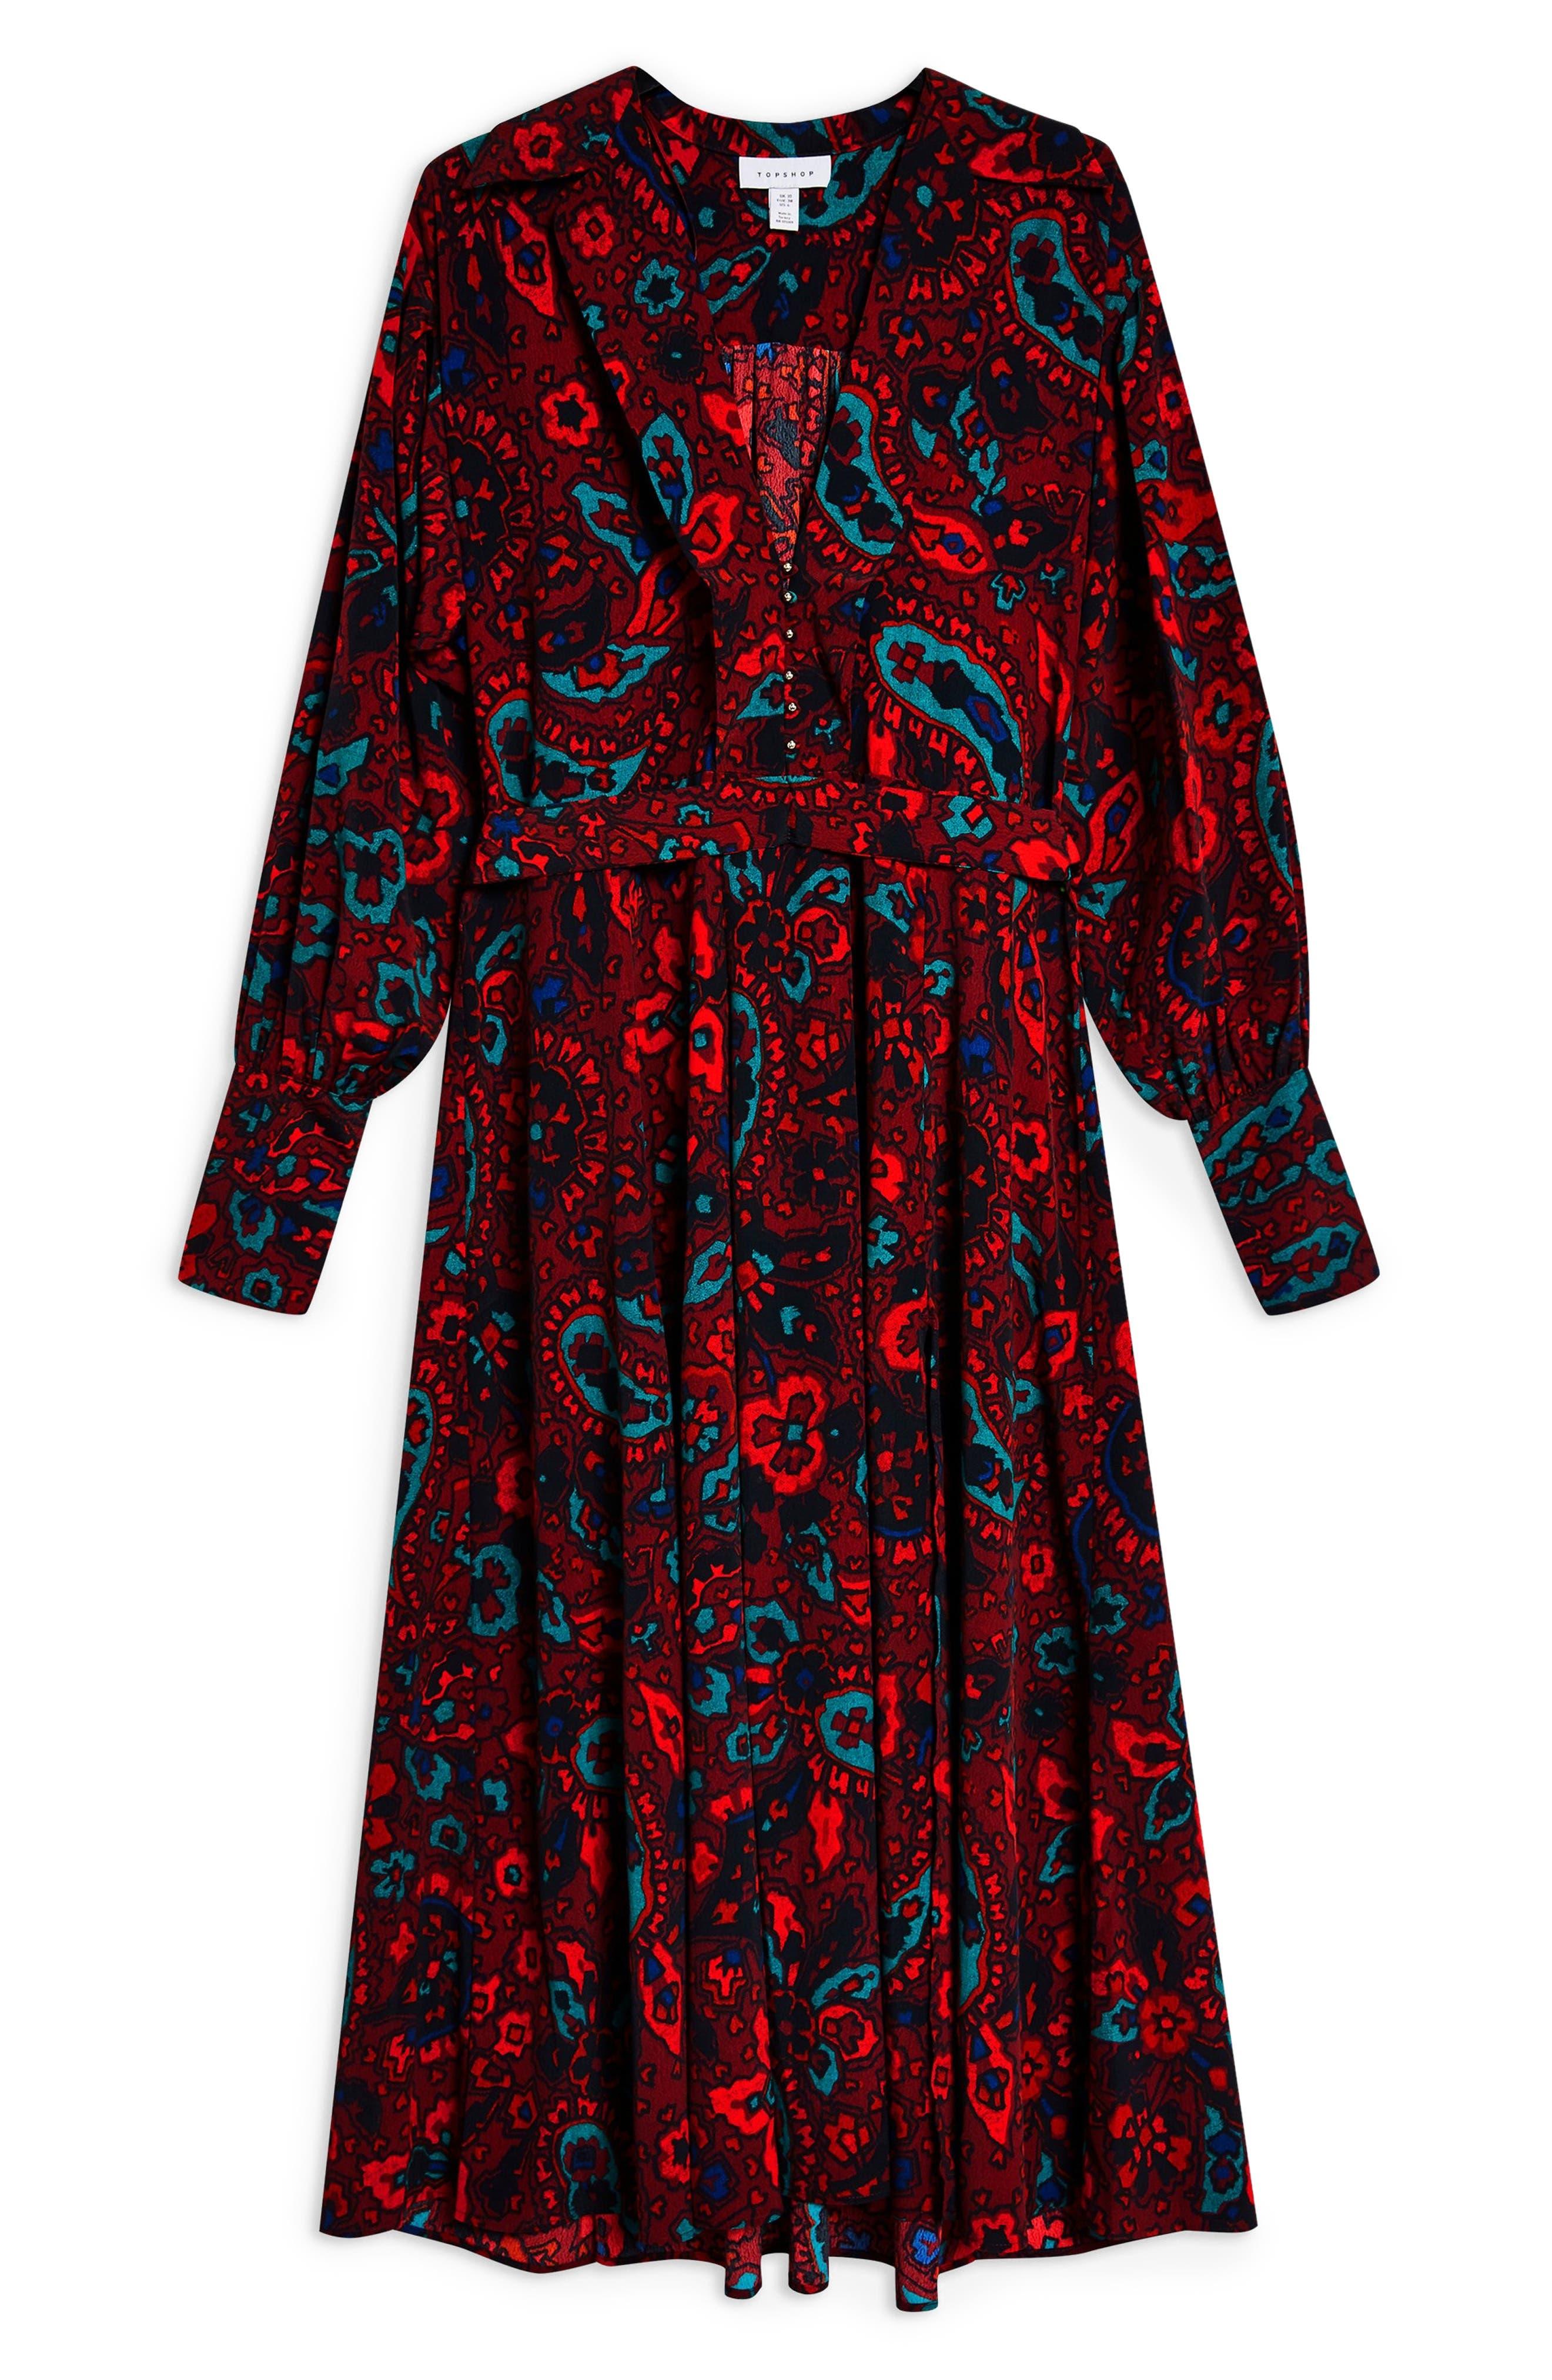 TOPSHOP, Paisley Oversize Shirtdress, Alternate thumbnail 5, color, 640